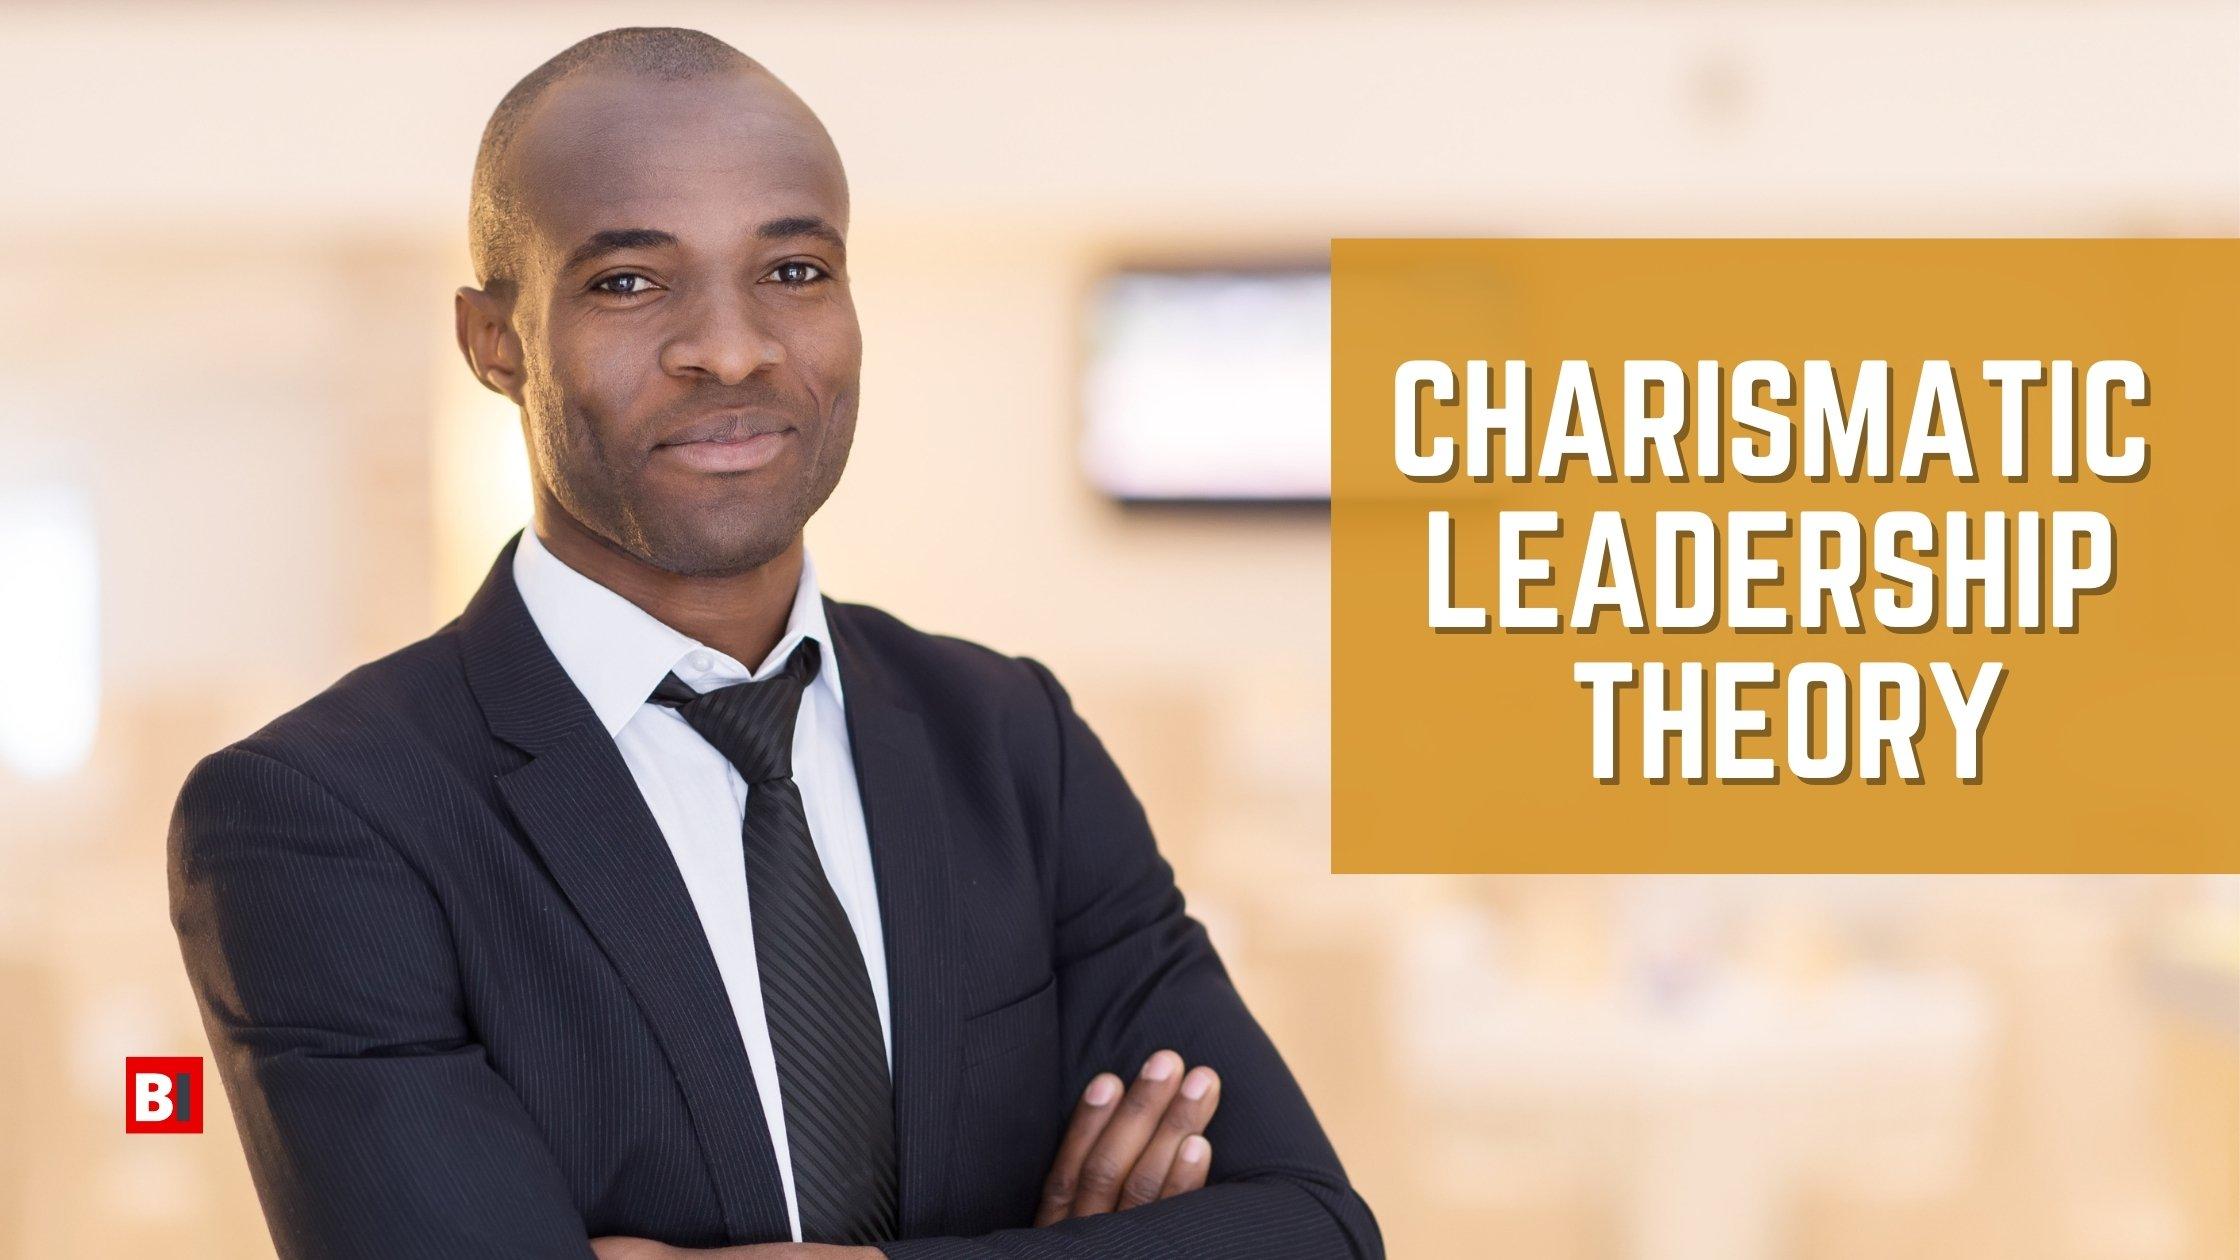 Charismatic Leadership Theory